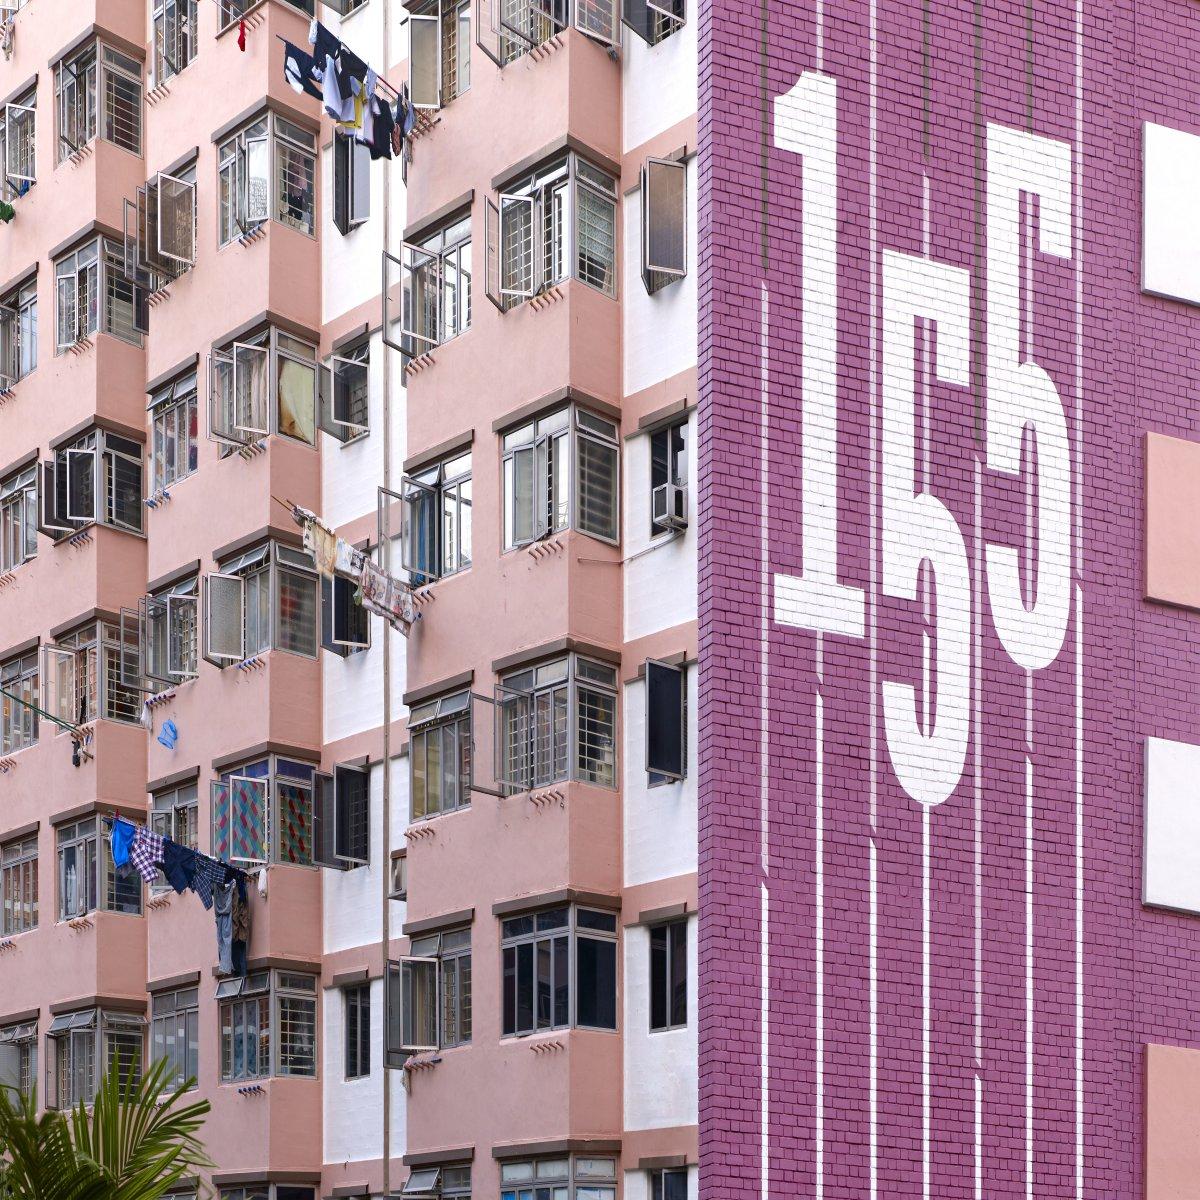 zhilye doma Singapura foto 9